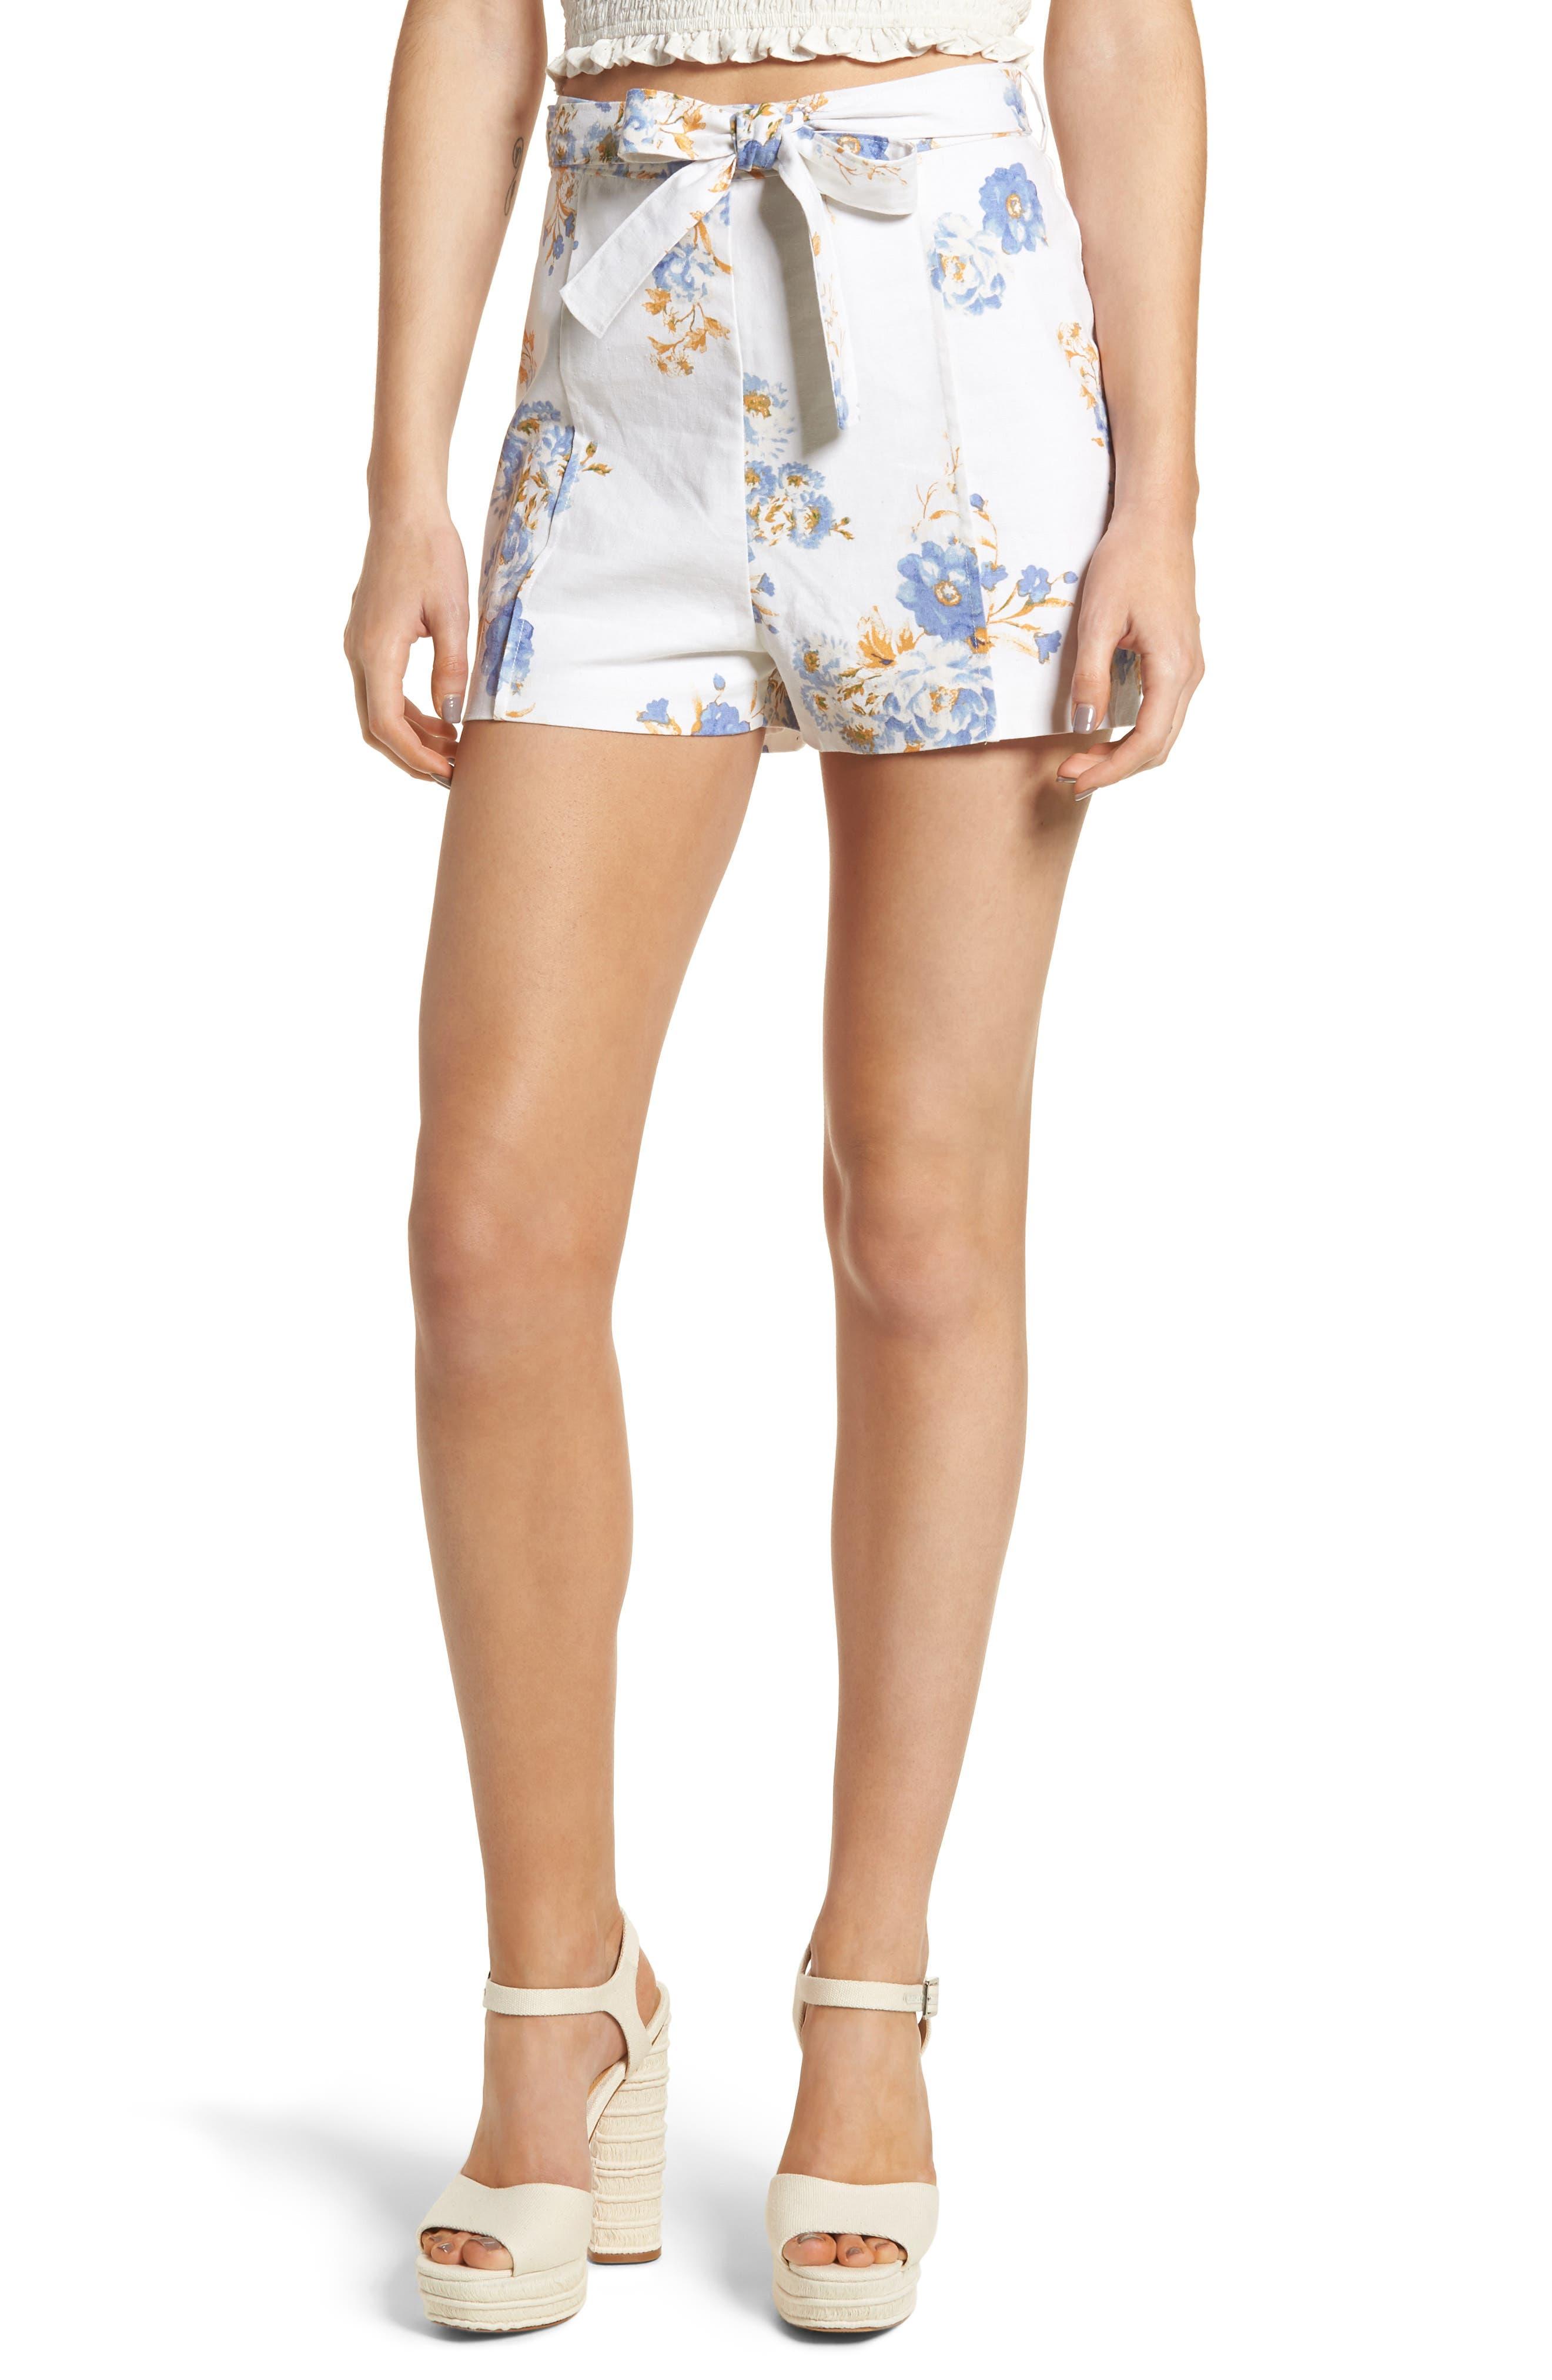 WAYF Matera High Waist Shorts